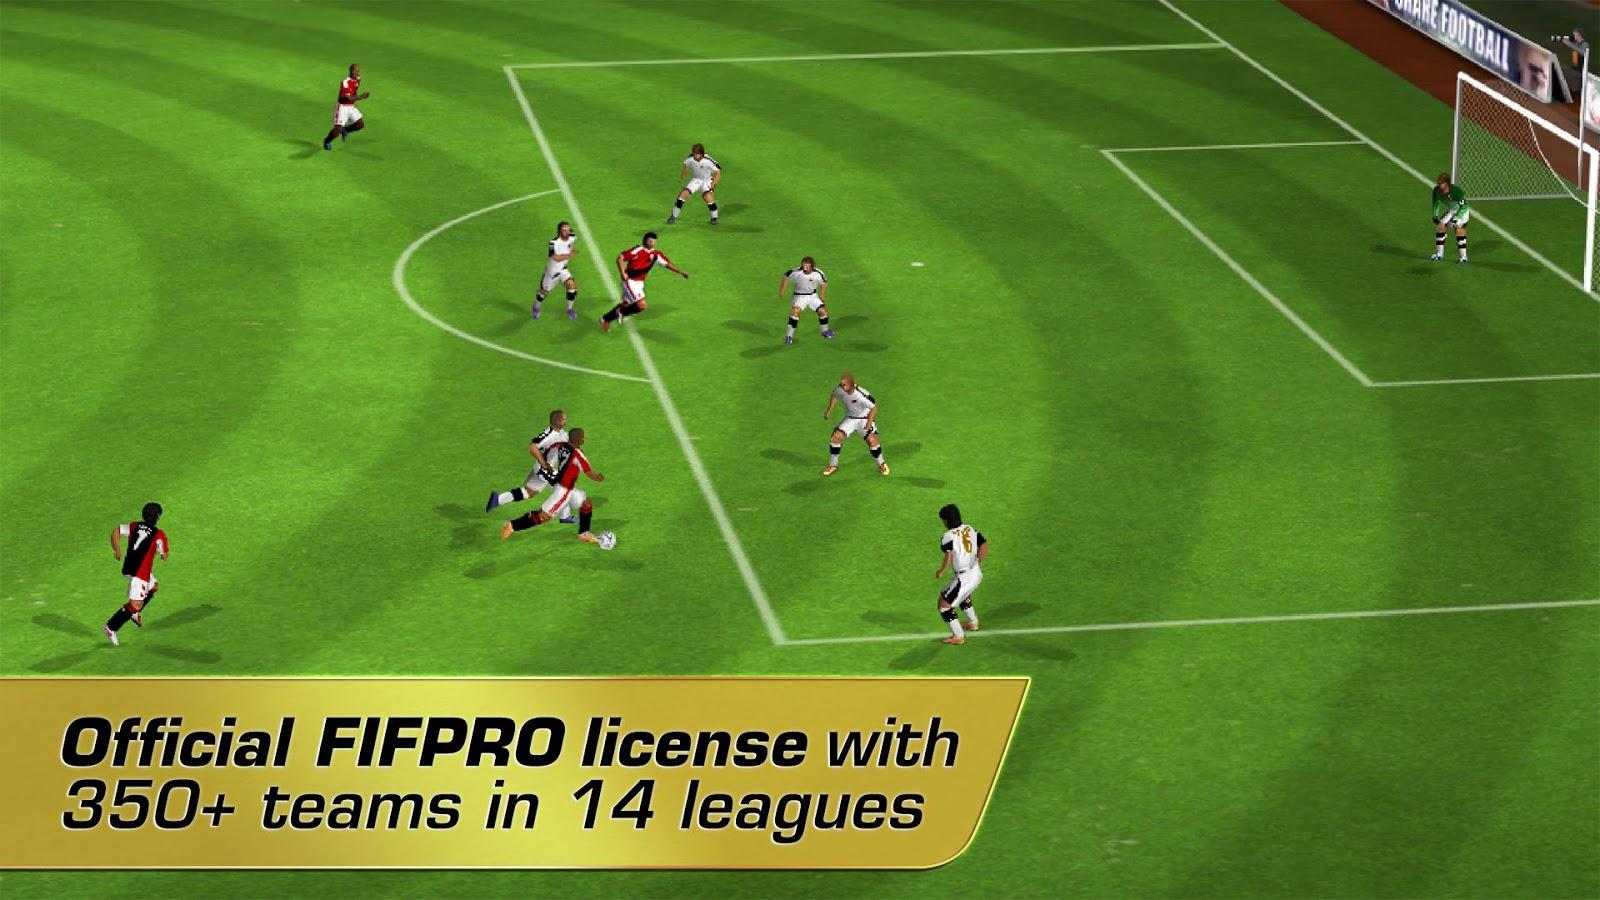 Real Football 2012 v1.6.1 .apk File